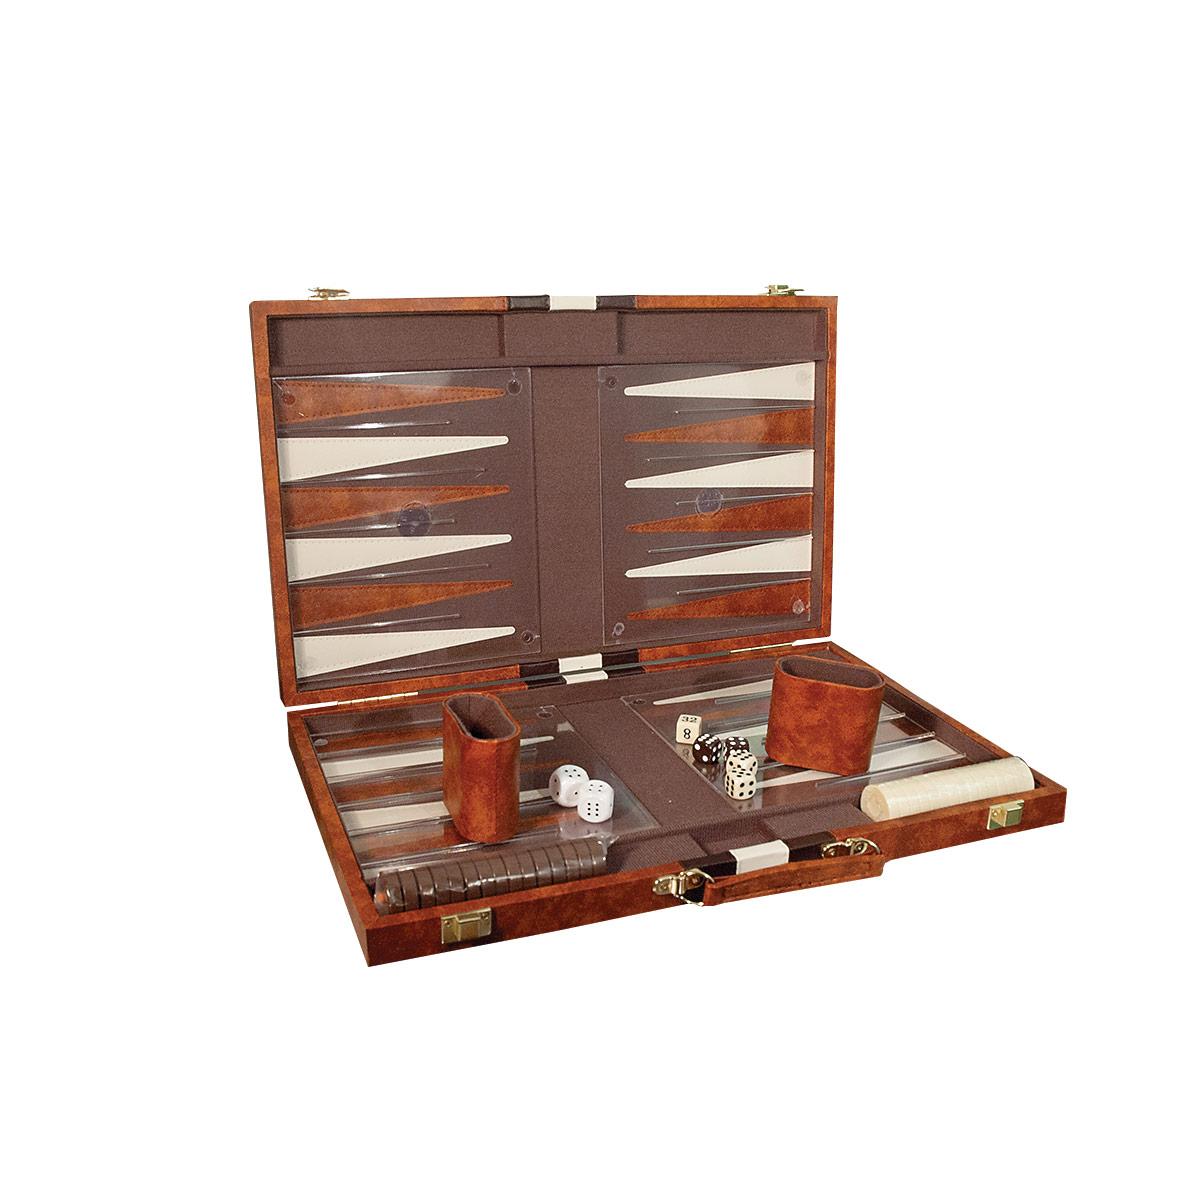 Deluxe Backgammon Set - Tactile